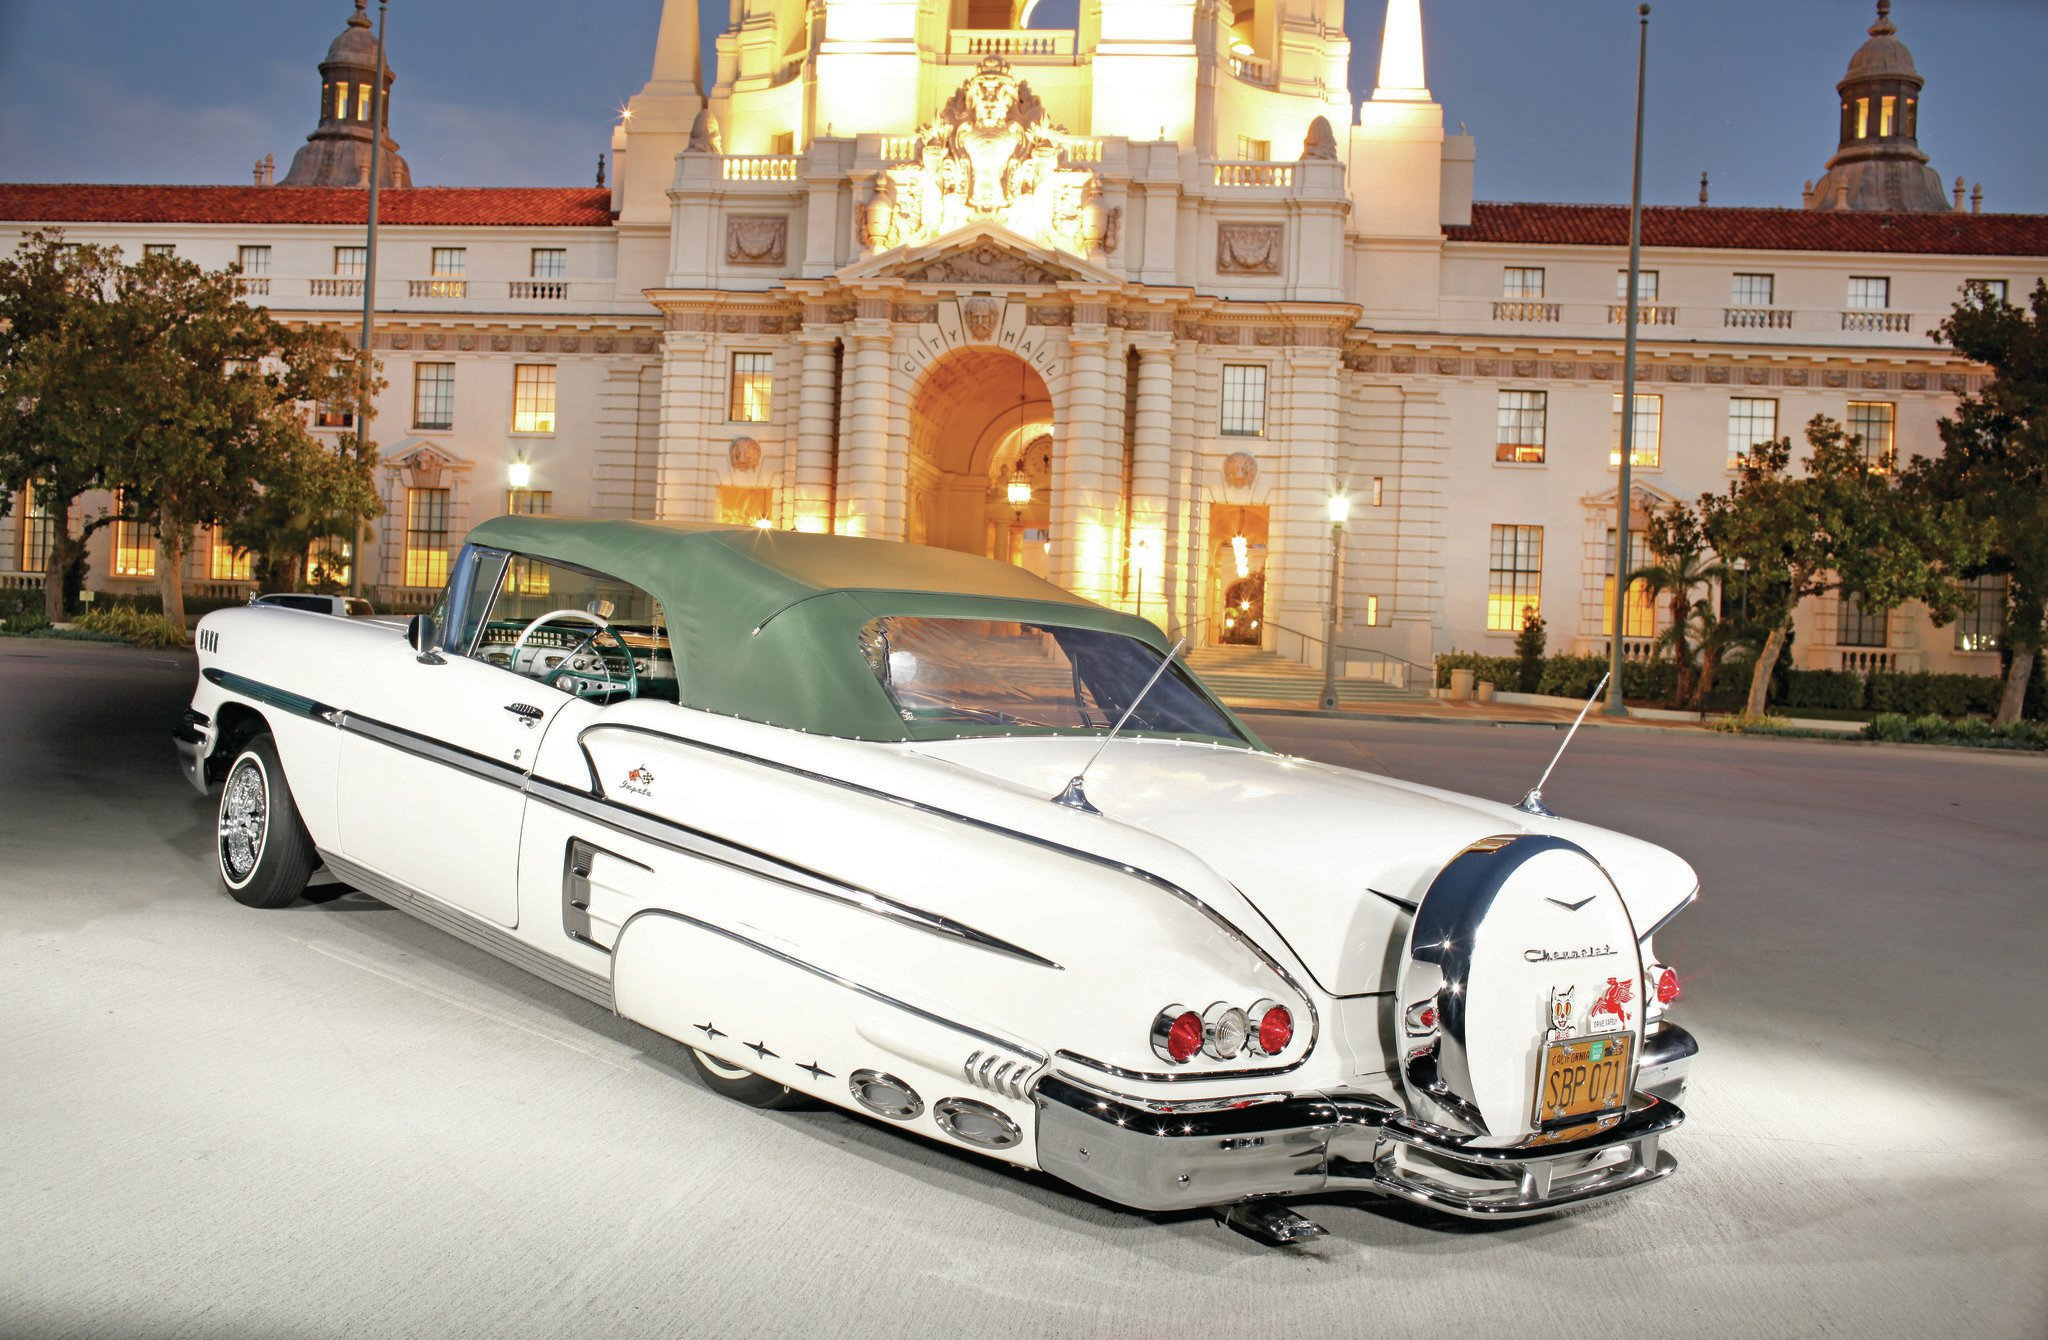 1958 Chevrolet Impala Convertible - The Engagement